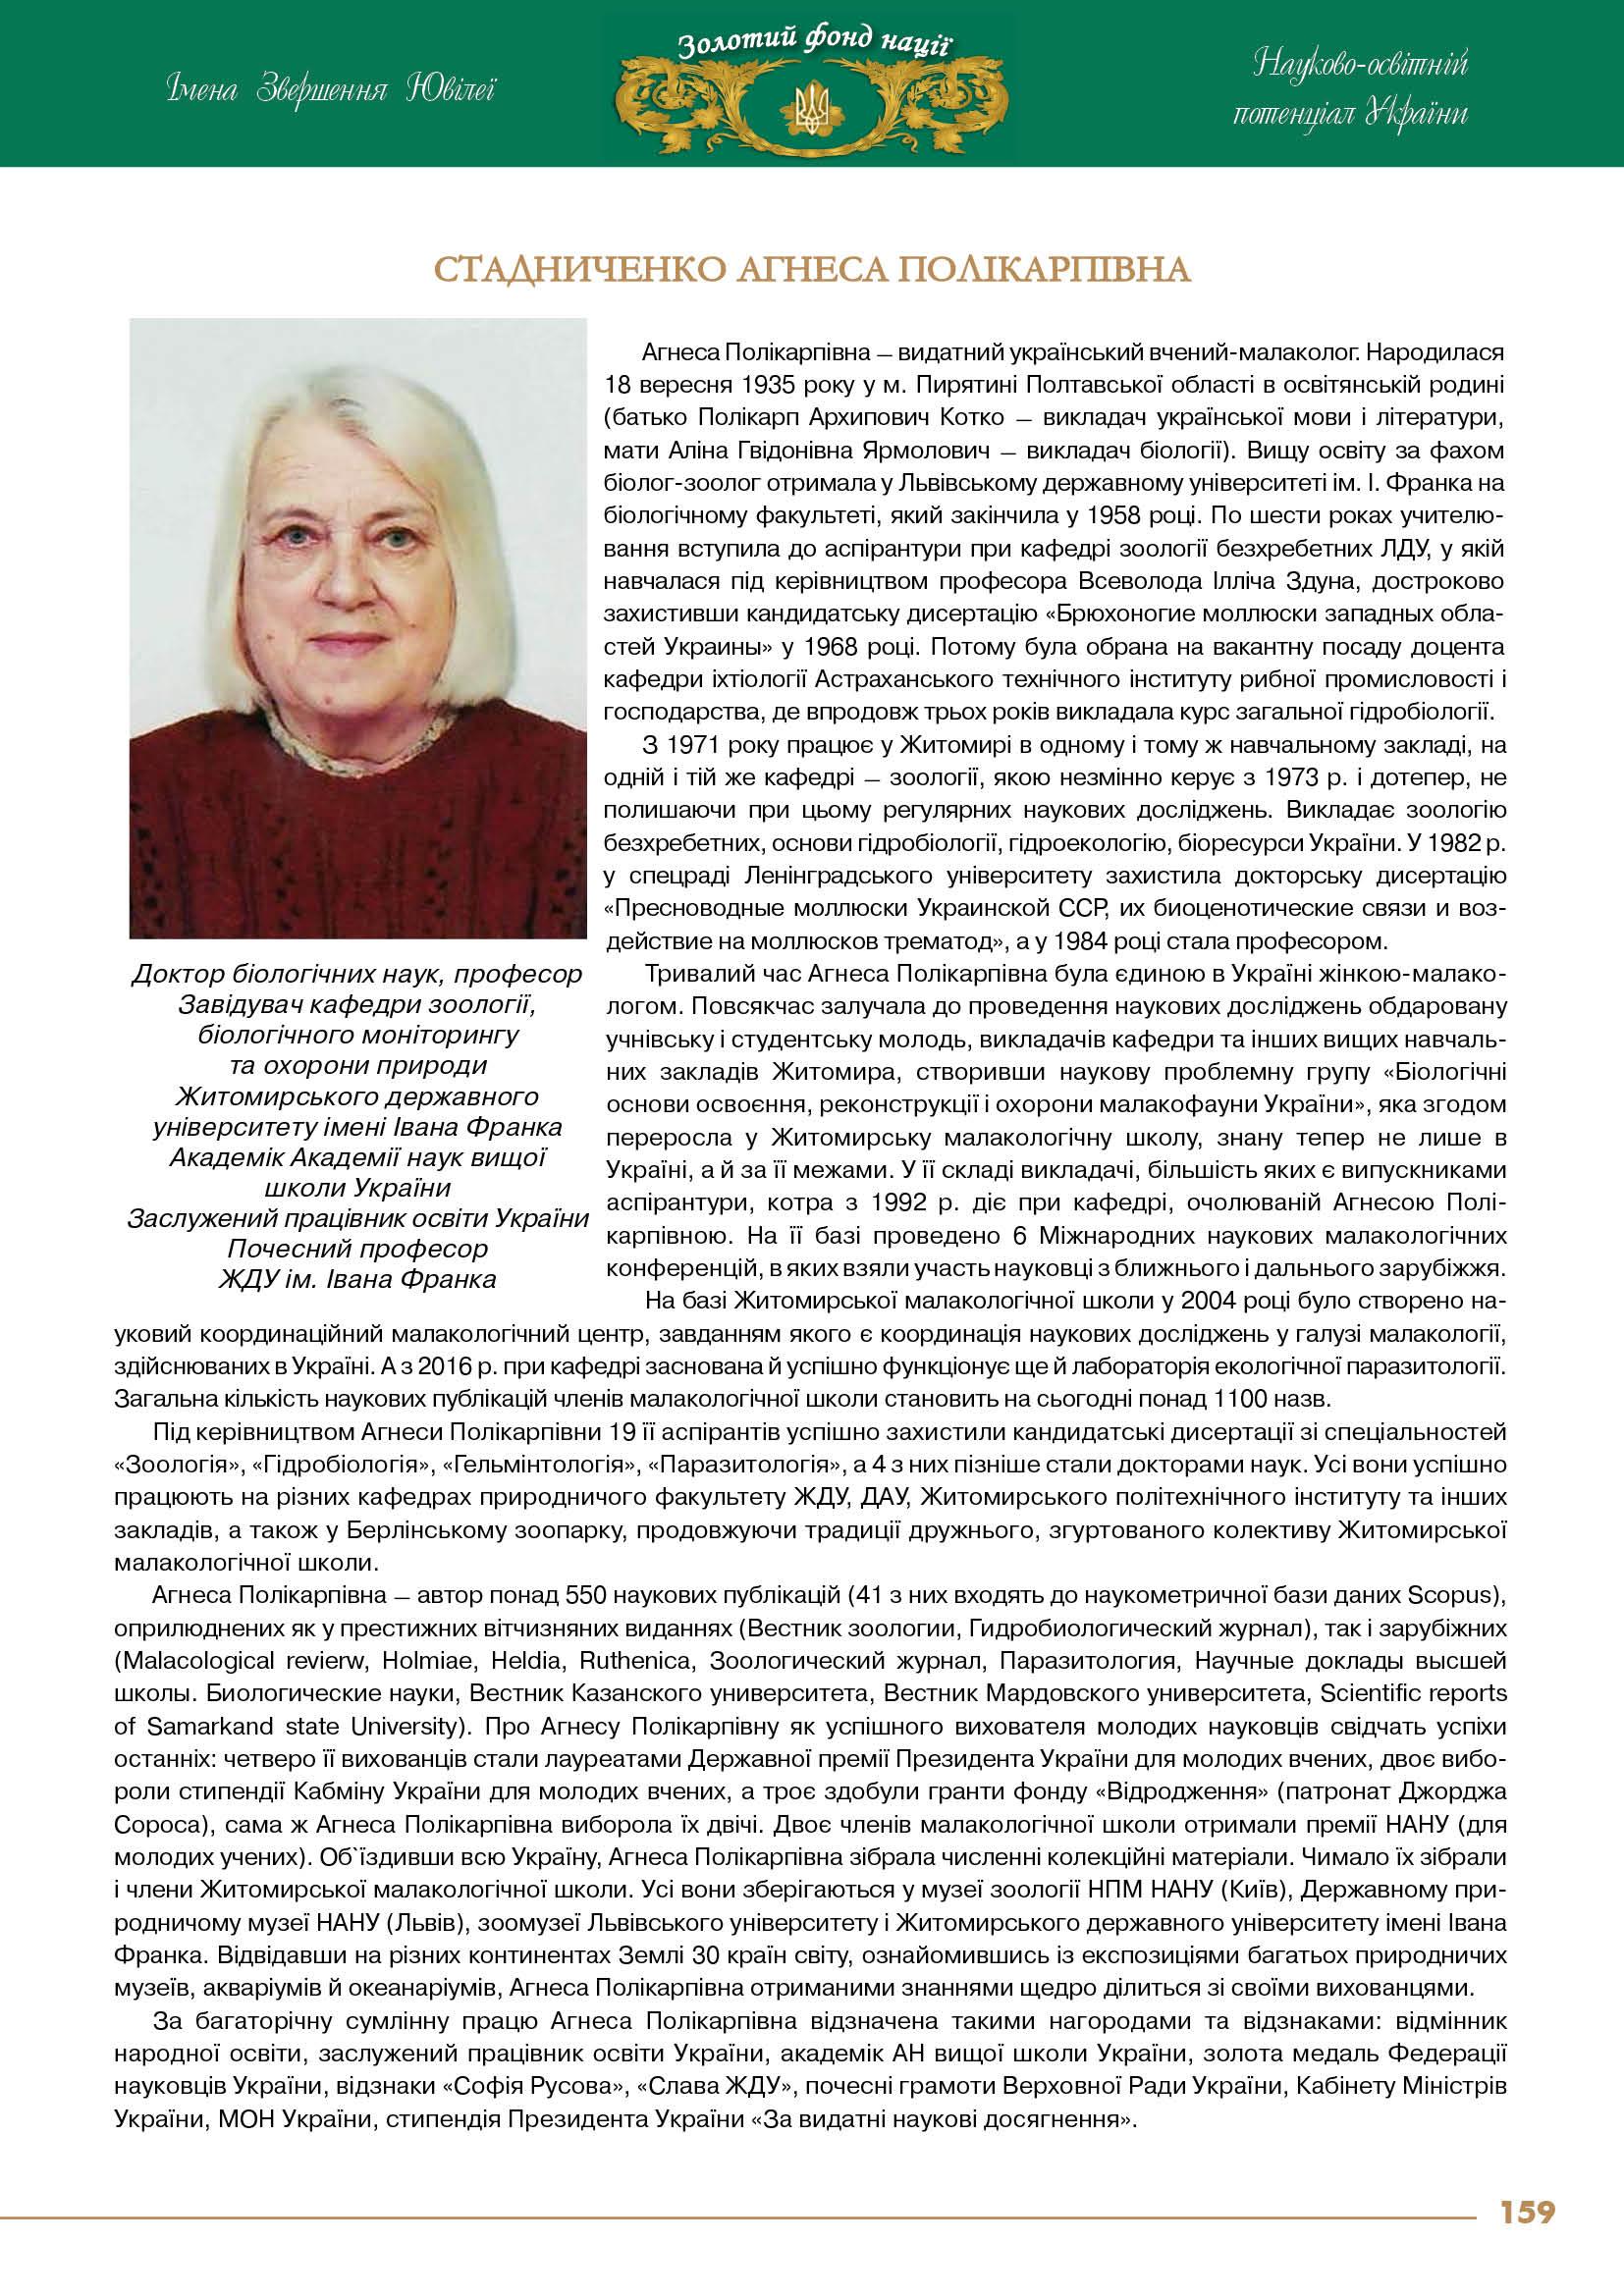 Стадниченко Агнеса Полікарпівна